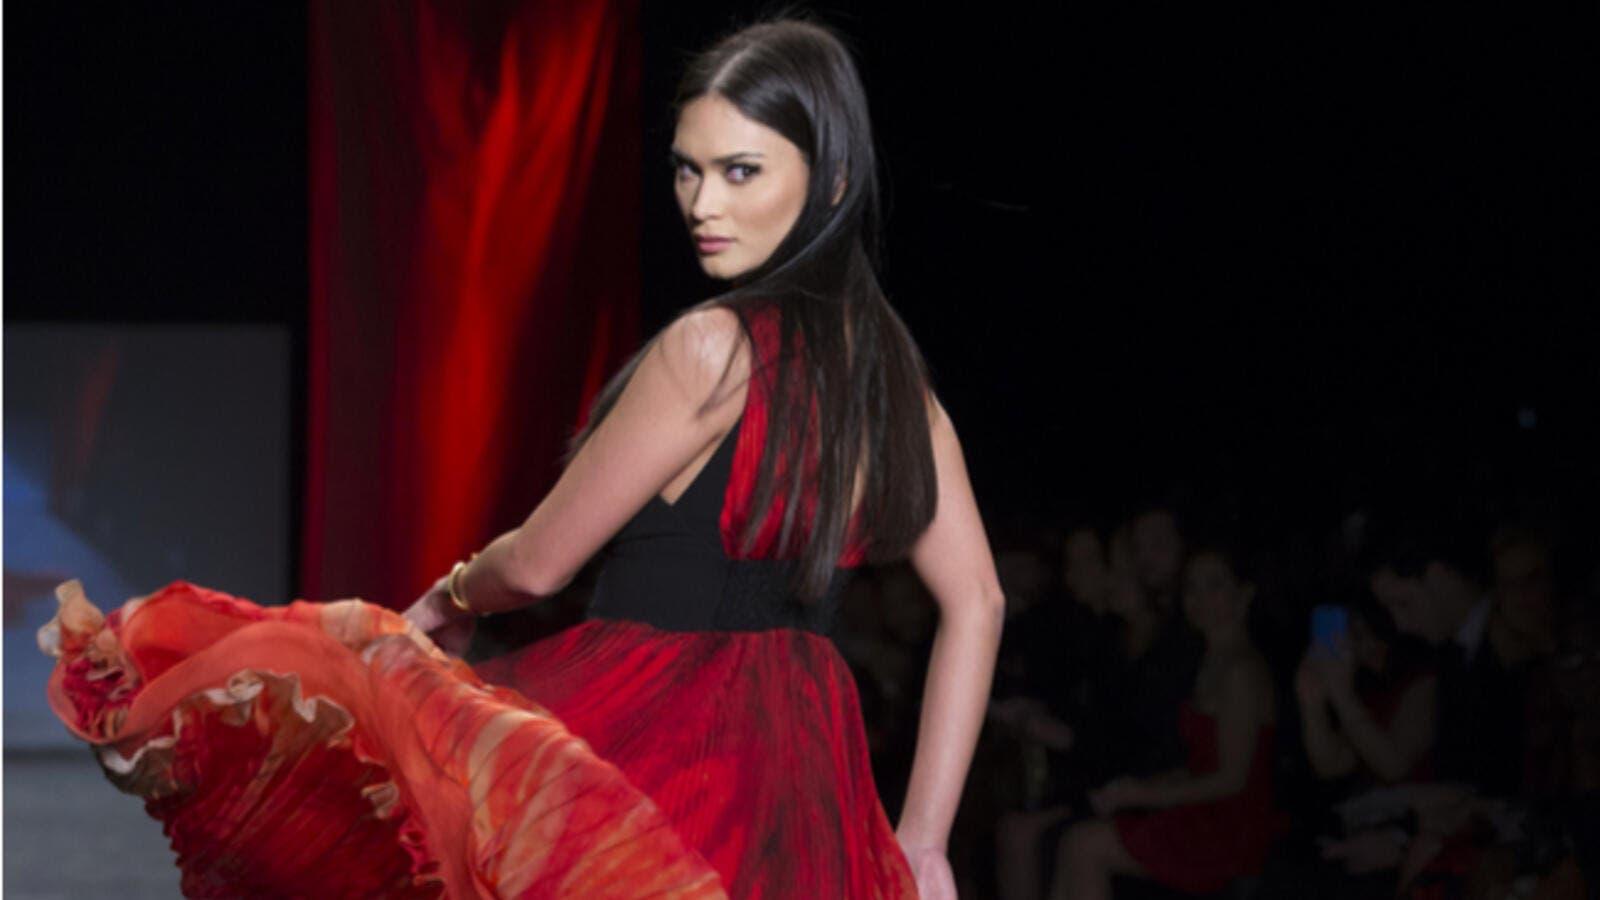 Filipino Former Miss Universe Pia Wurtzbach to visit Dubai